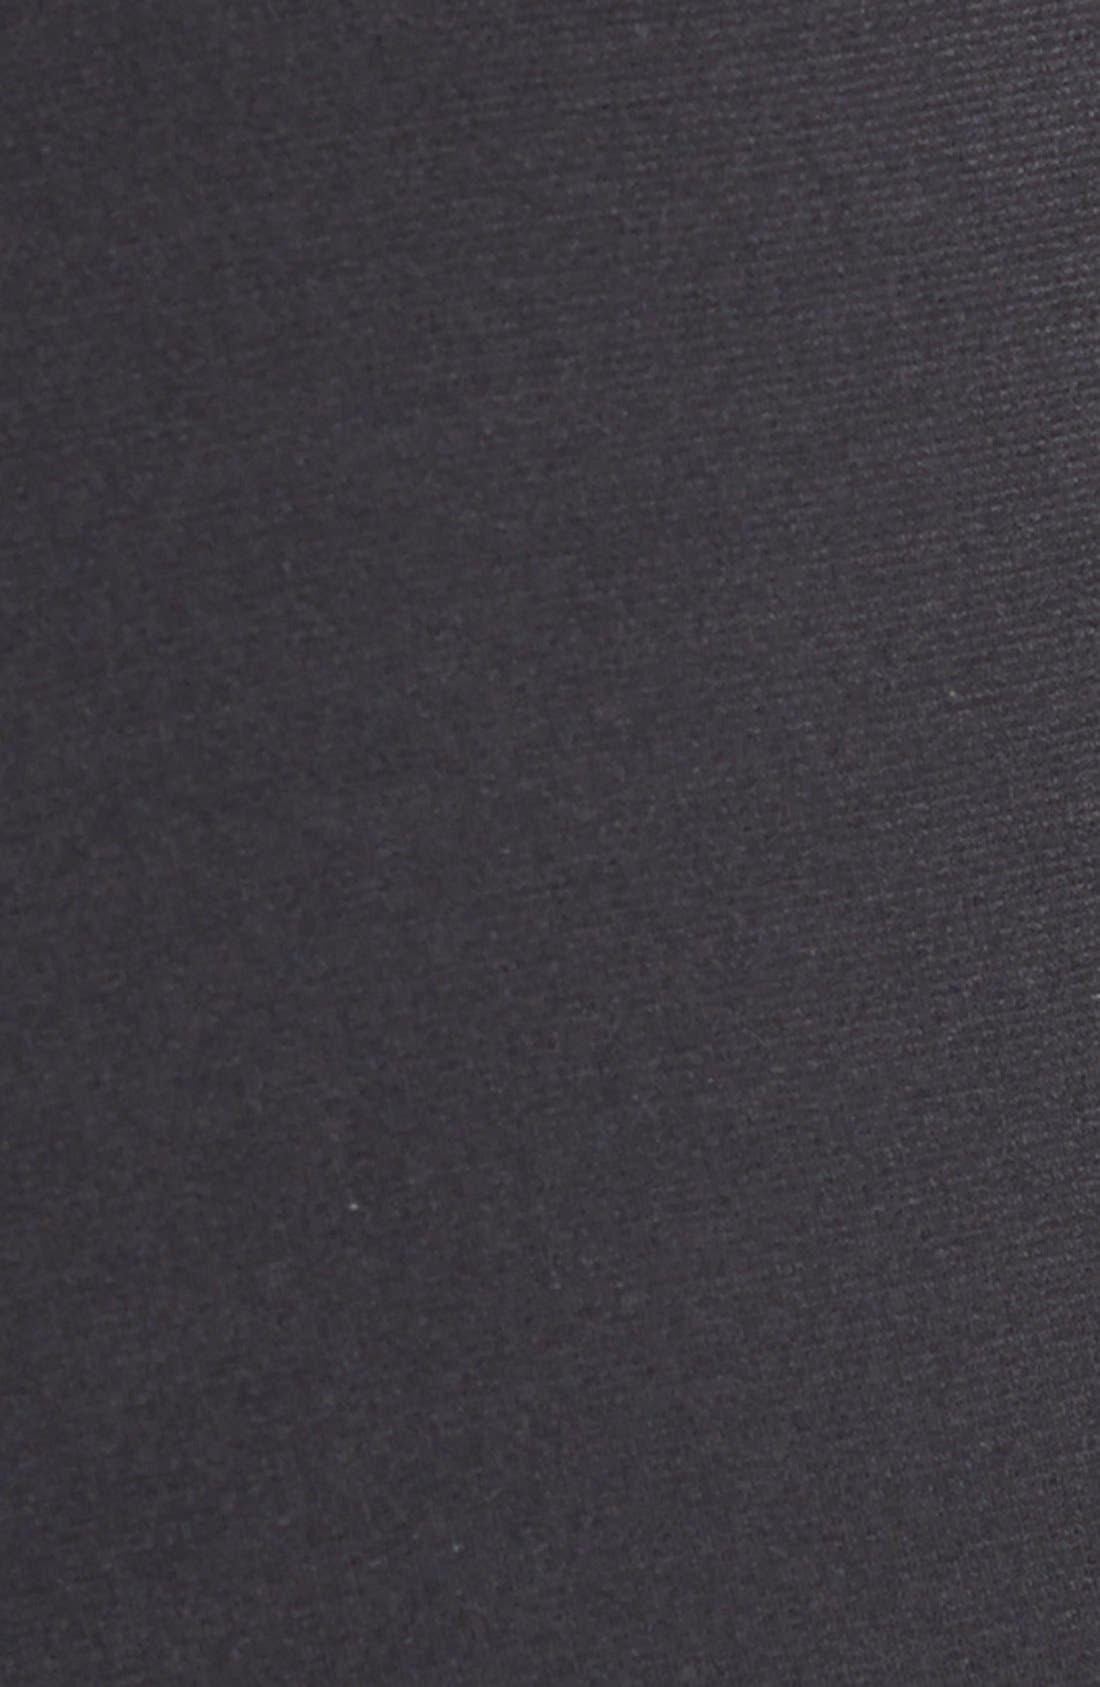 Sequin Front Leggings,                             Alternate thumbnail 4, color,                             001